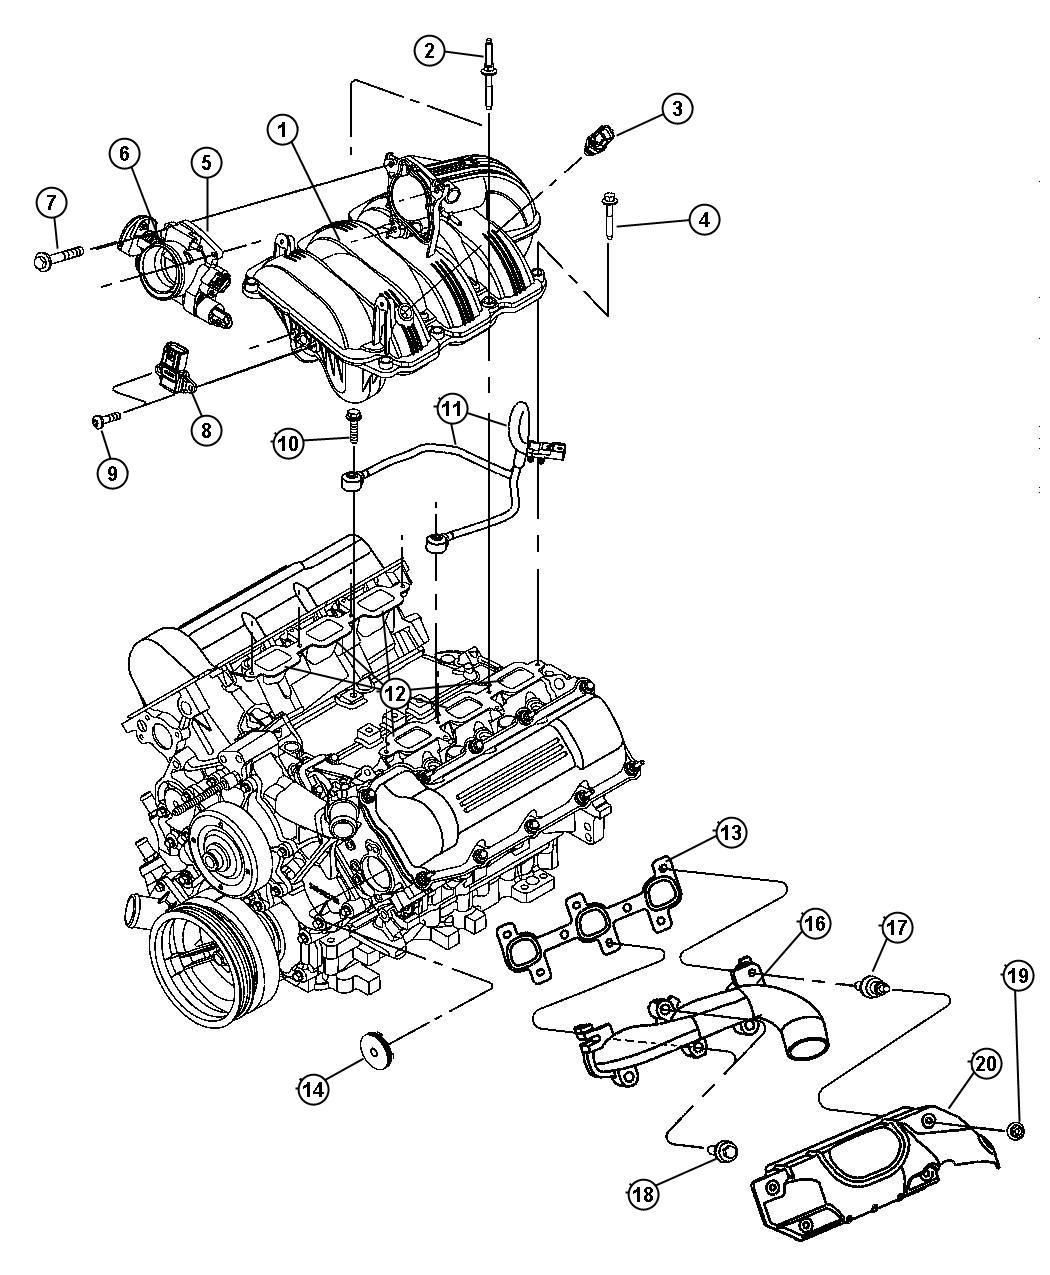 2012 jeep wrangler wiring diagram 2002 suzuki eiger 400 4x4 spark plug html